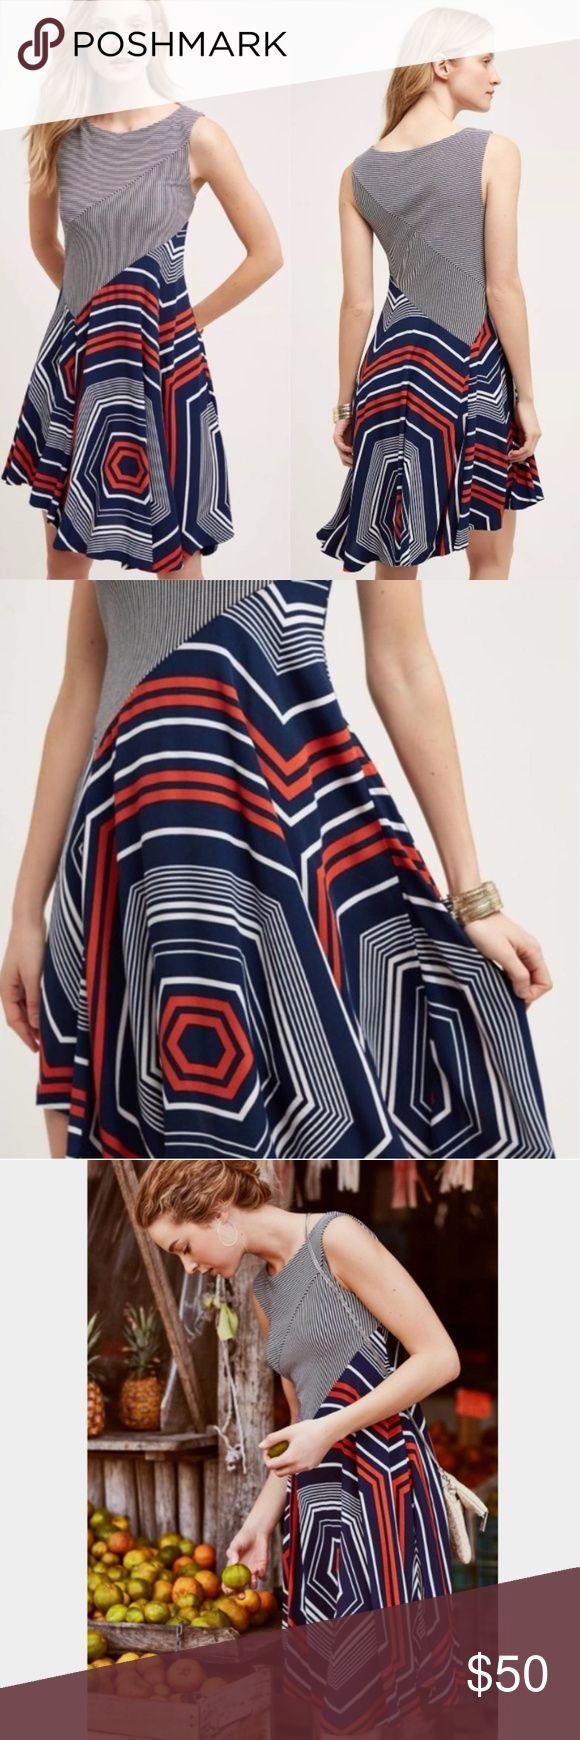 44318ab035f Anthropologie Maeve Cameron Colorblock Sun Dress M